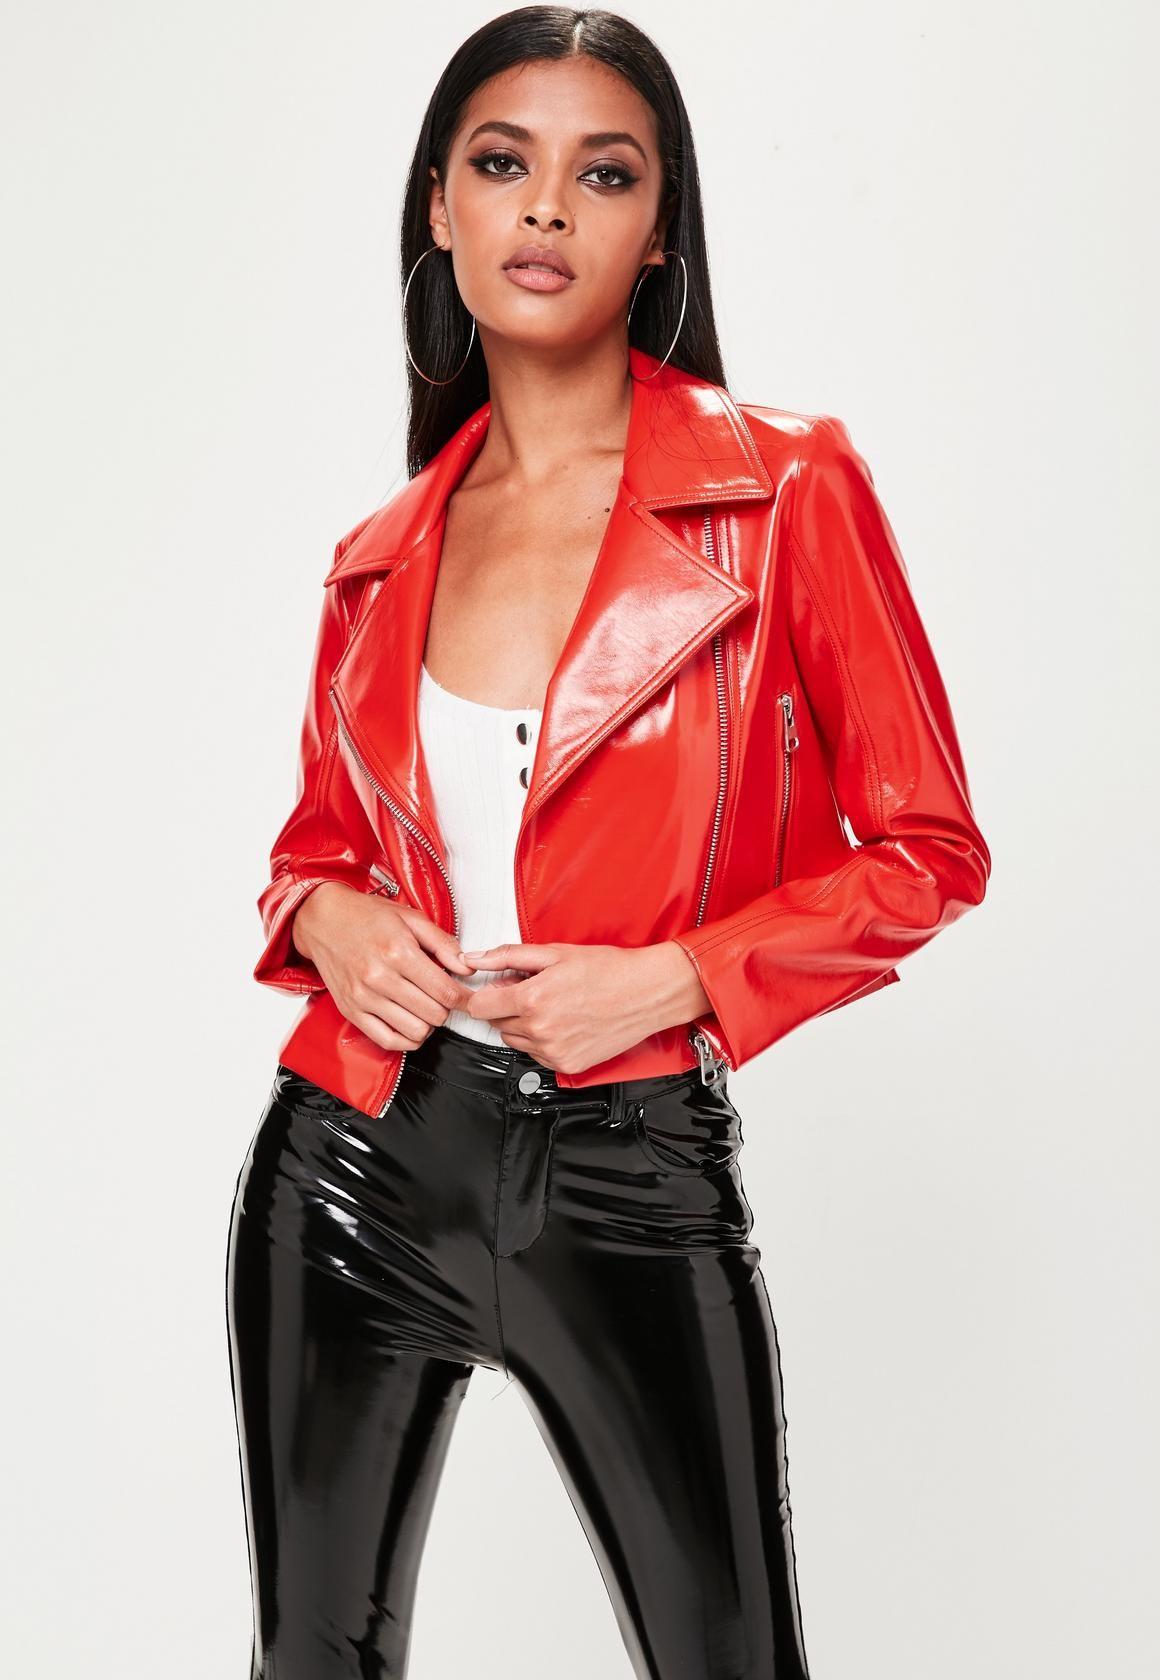 Missguided - Red Vinyl Biker Jacket wearethebikerstore.com  fashion  style   love  art  gifts  biker  menswear  women  homedecor  leathercraft df75404615